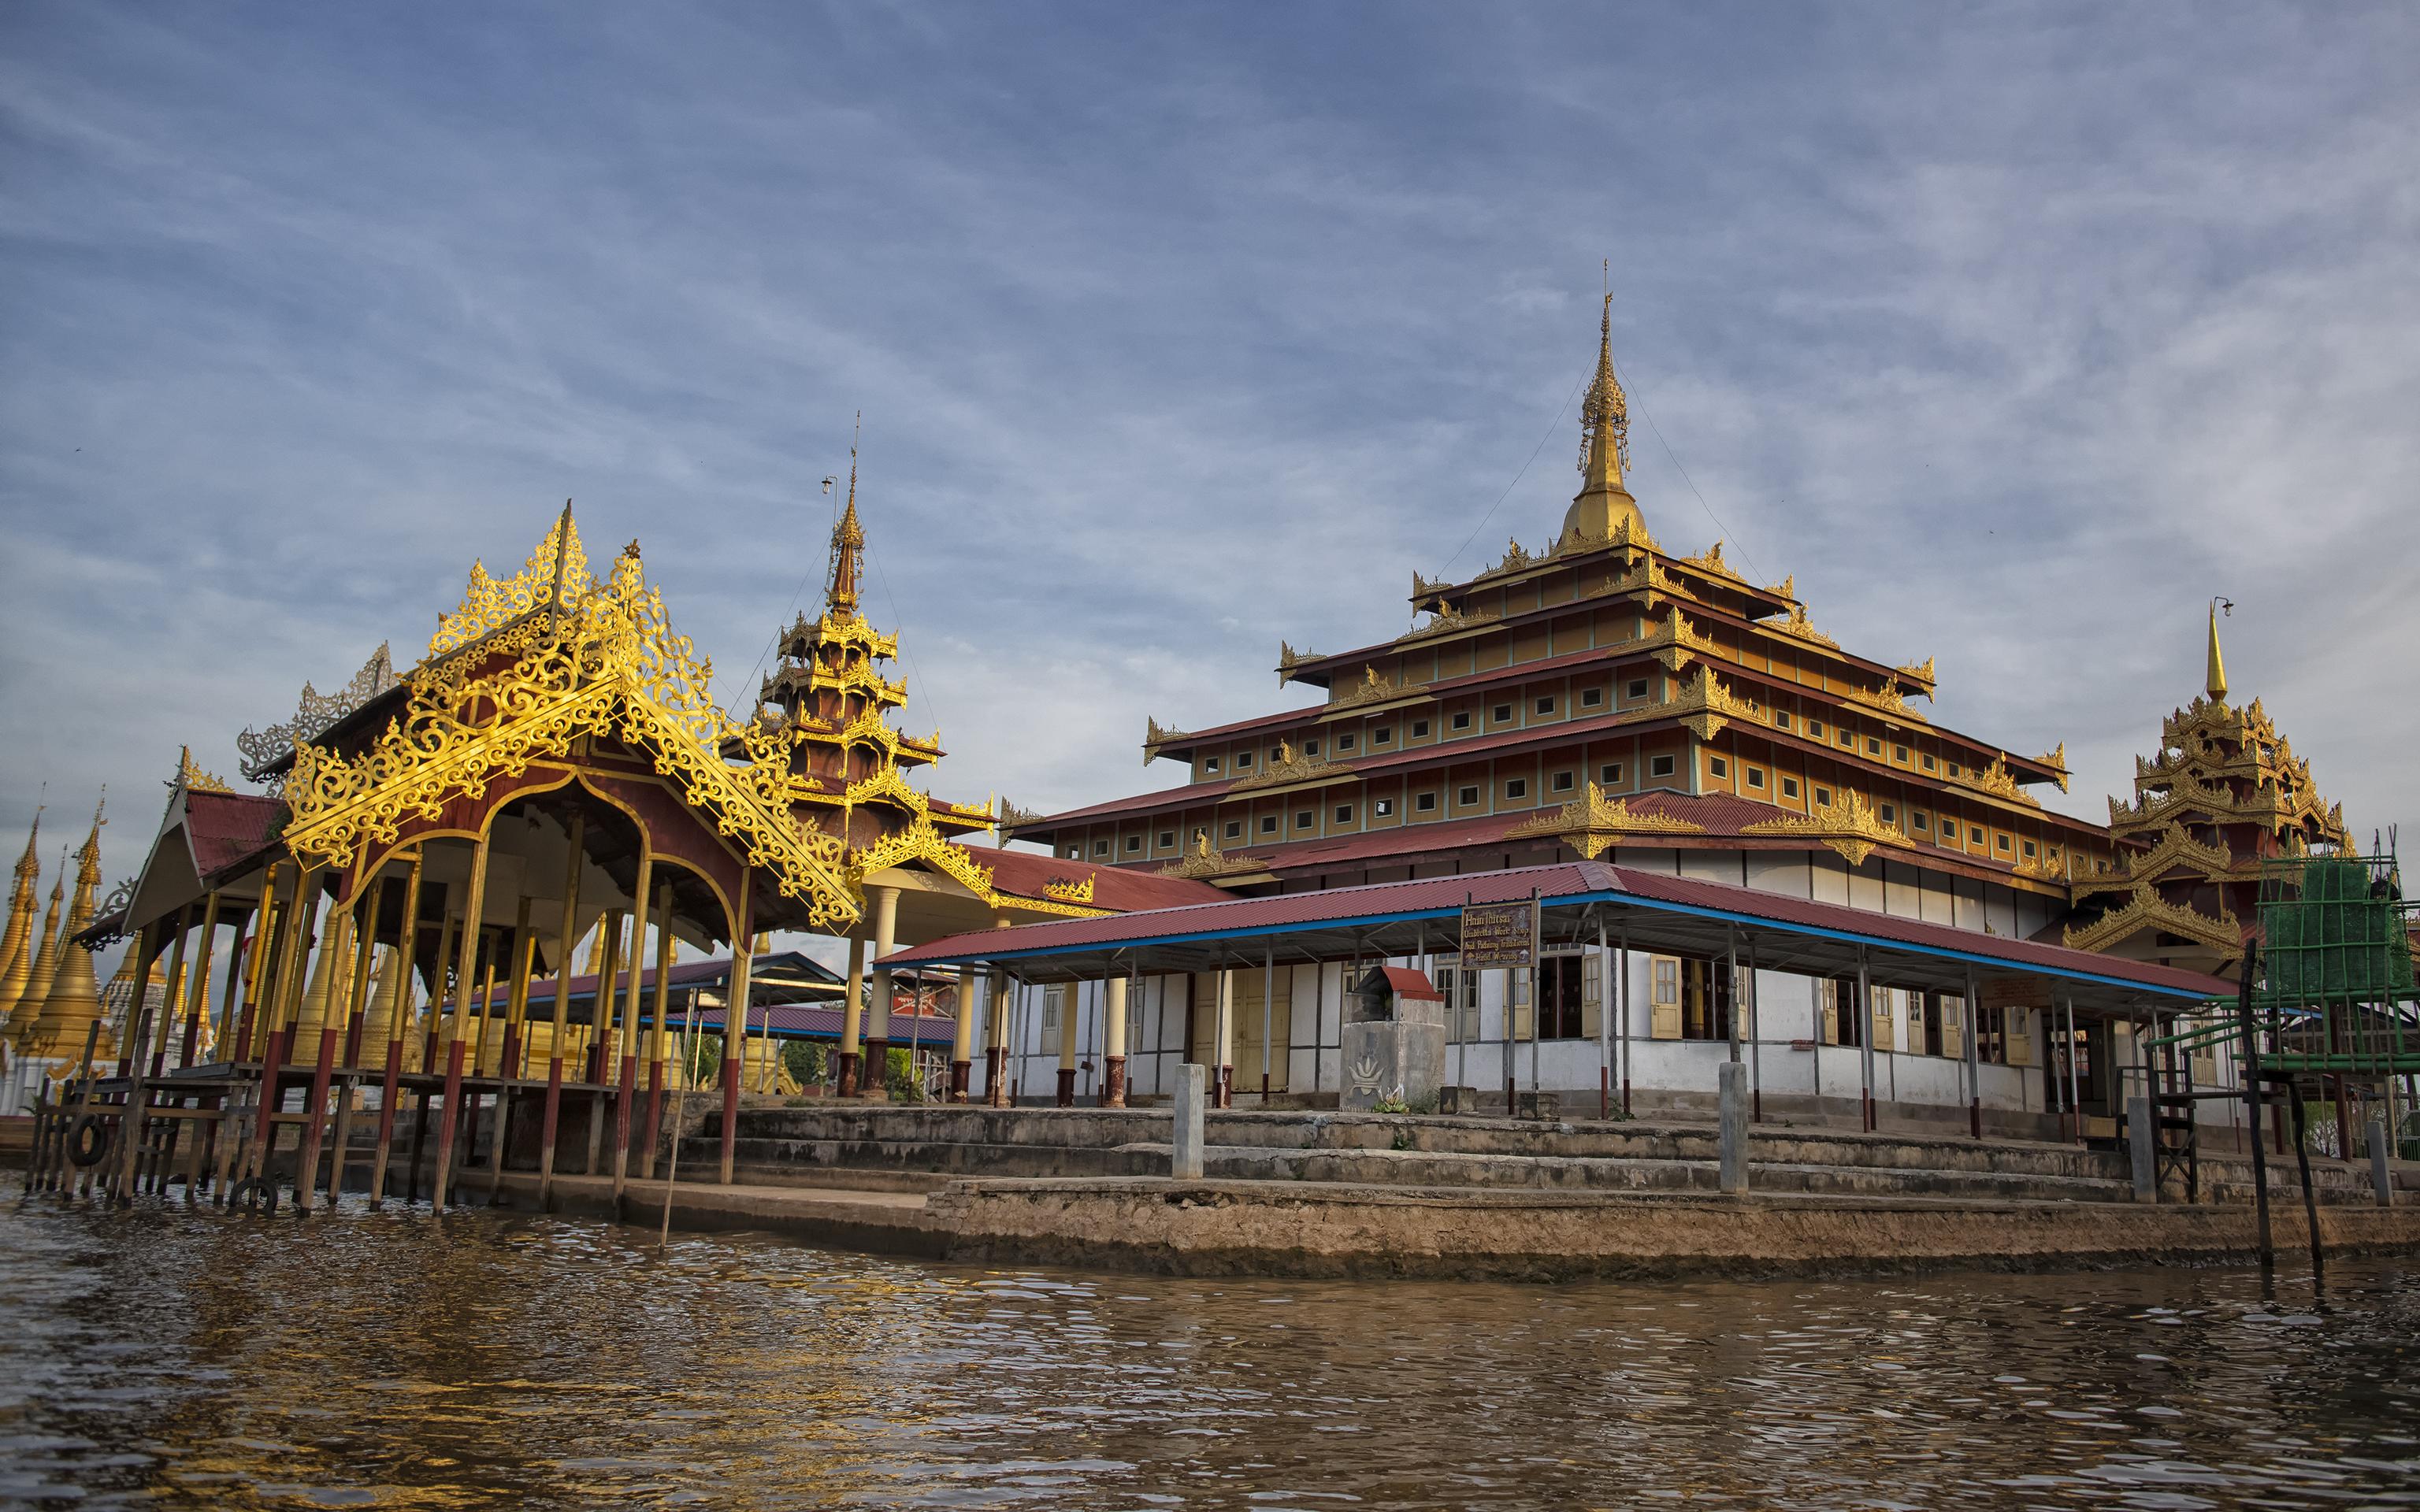 Indein Stupas Pagodas